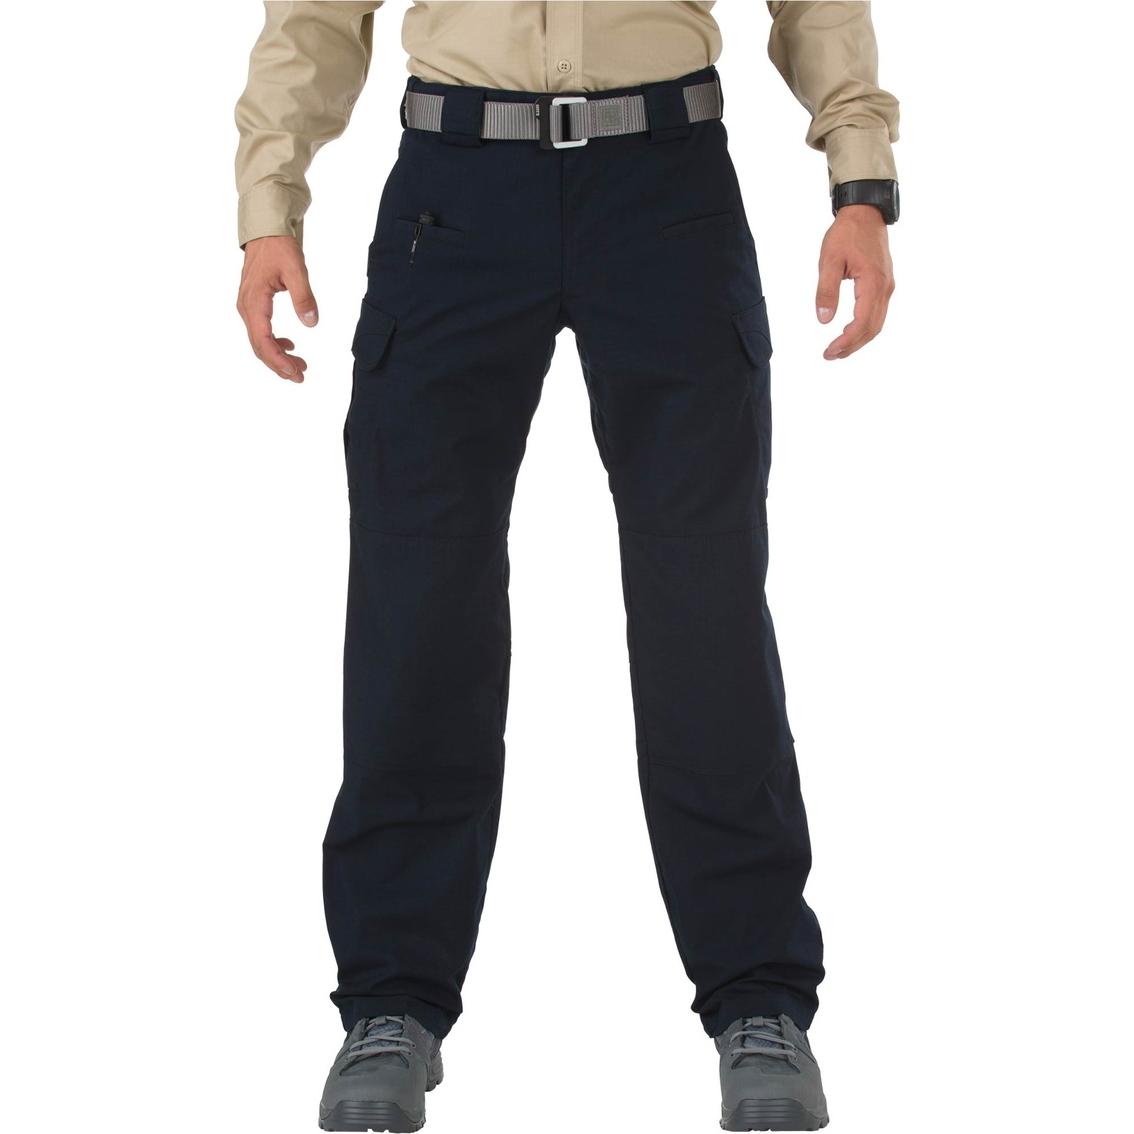 ae8851c3efd75 5.11 Stryke Pants   Pants   Apparel   Shop The Exchange